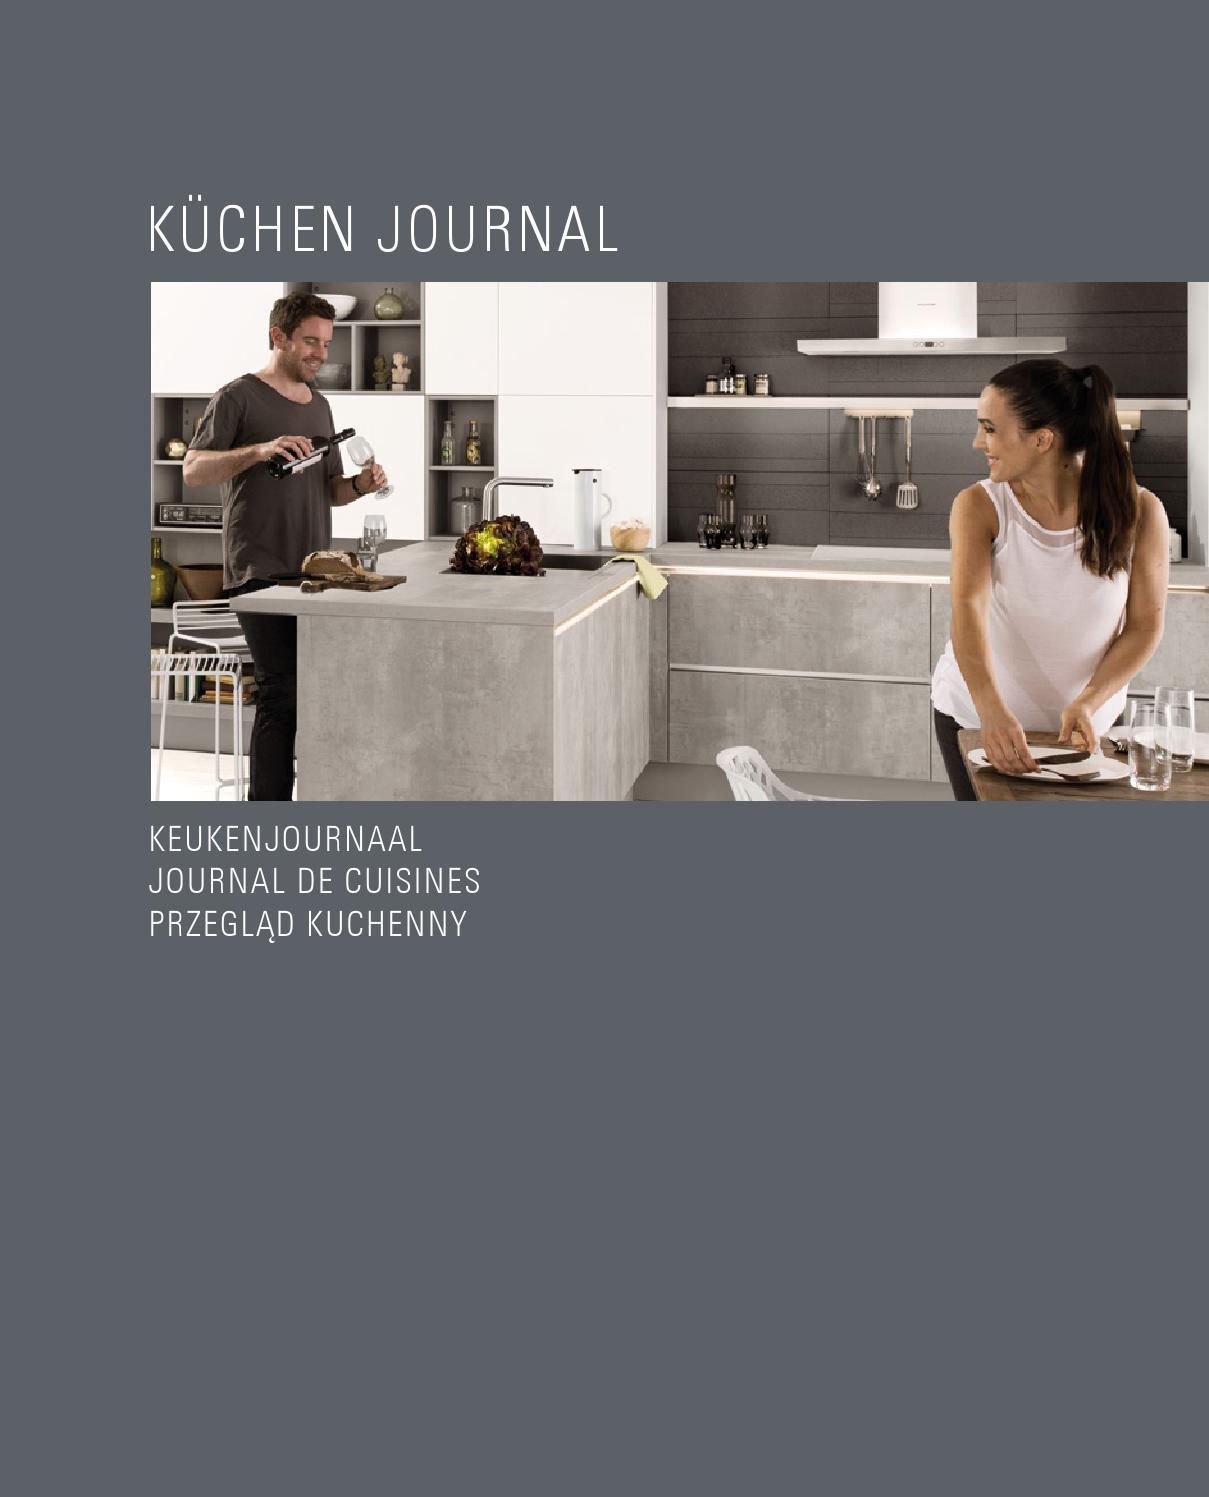 Hacker systemat keukens by ken vleminckx   issuu